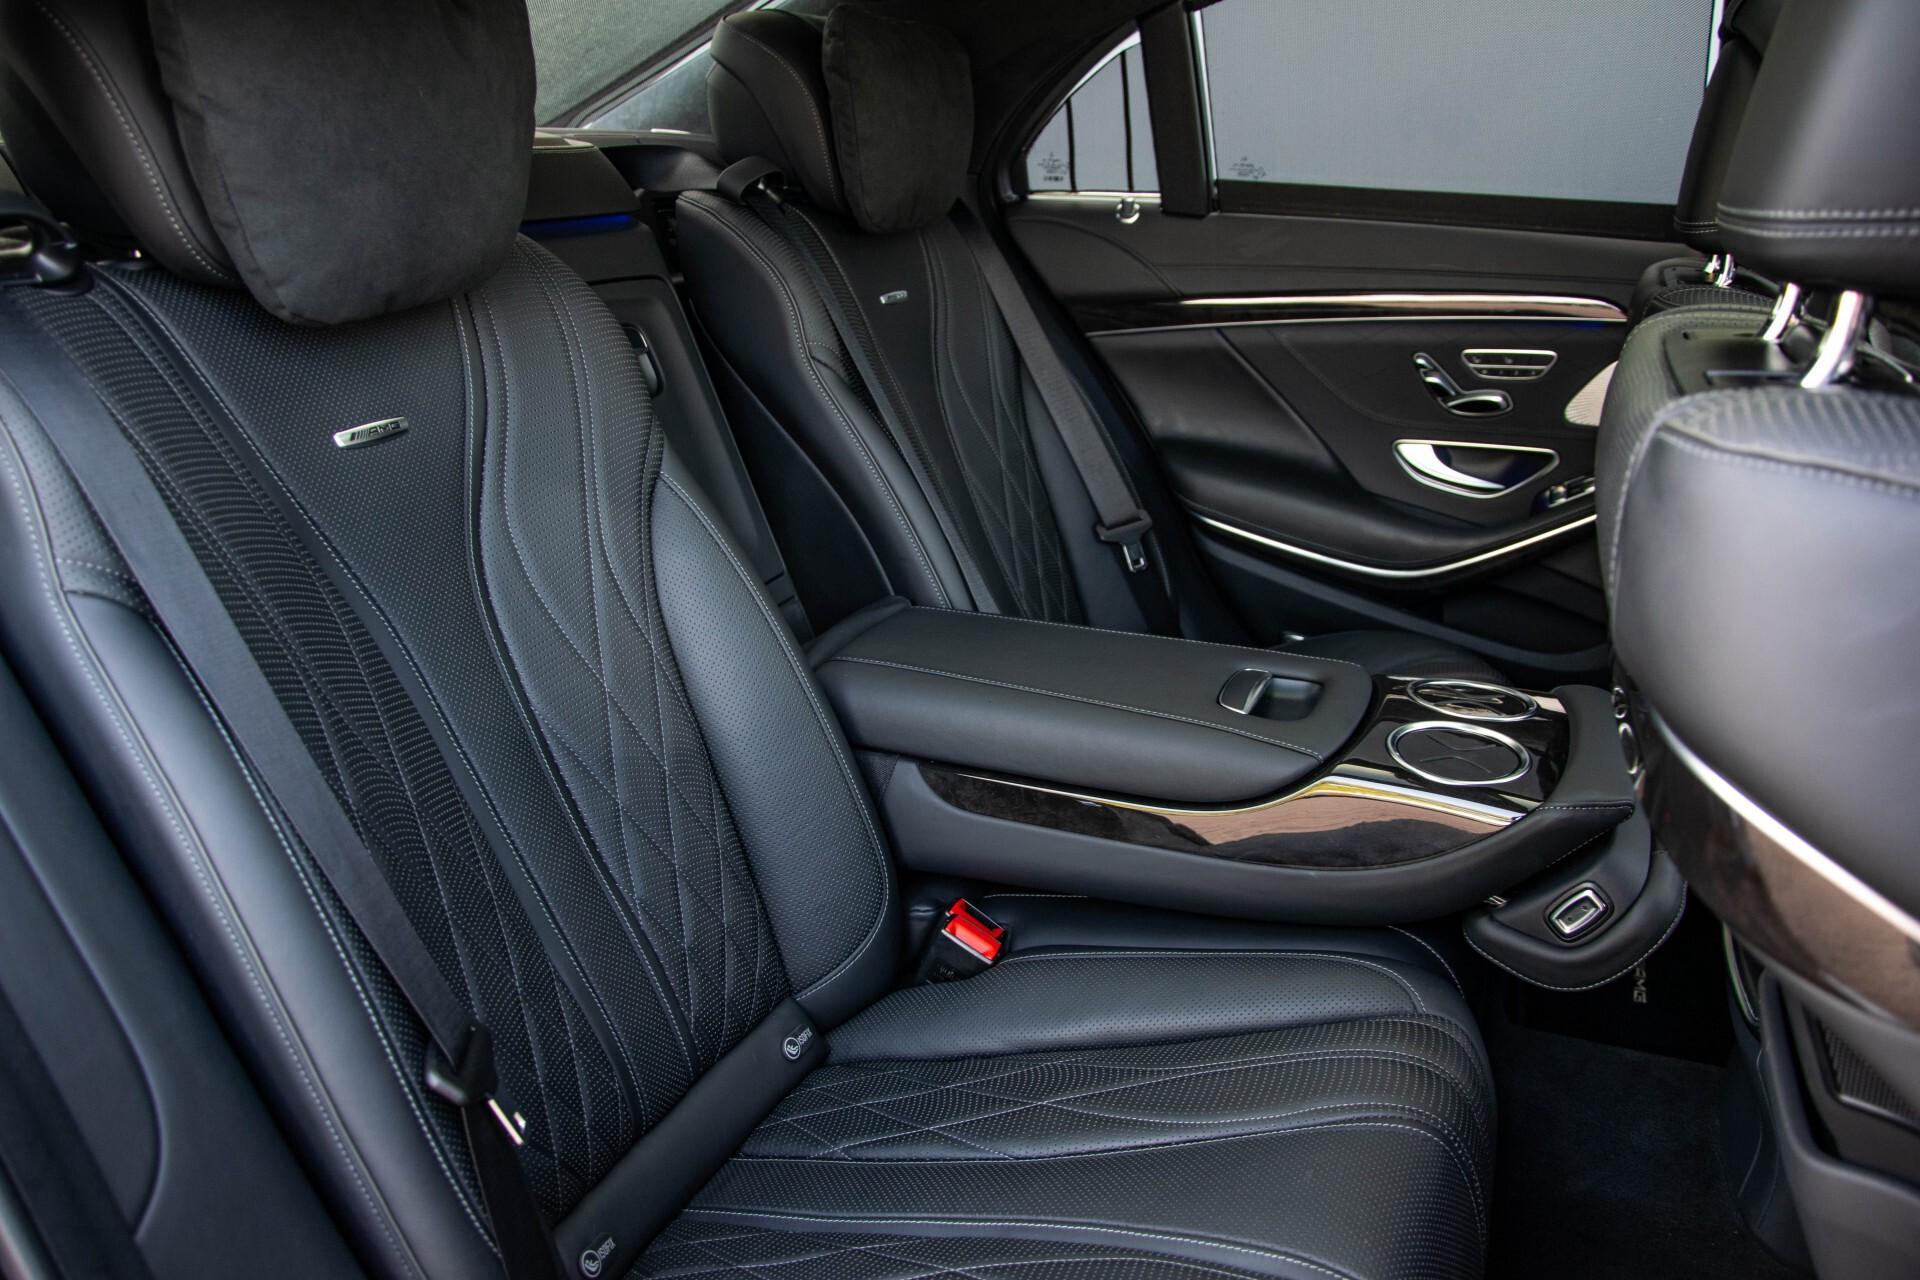 Mercedes-Benz S-Klasse 63 AMG Exclusive/Burmester High-End/Driverspack Aut7 Foto 5